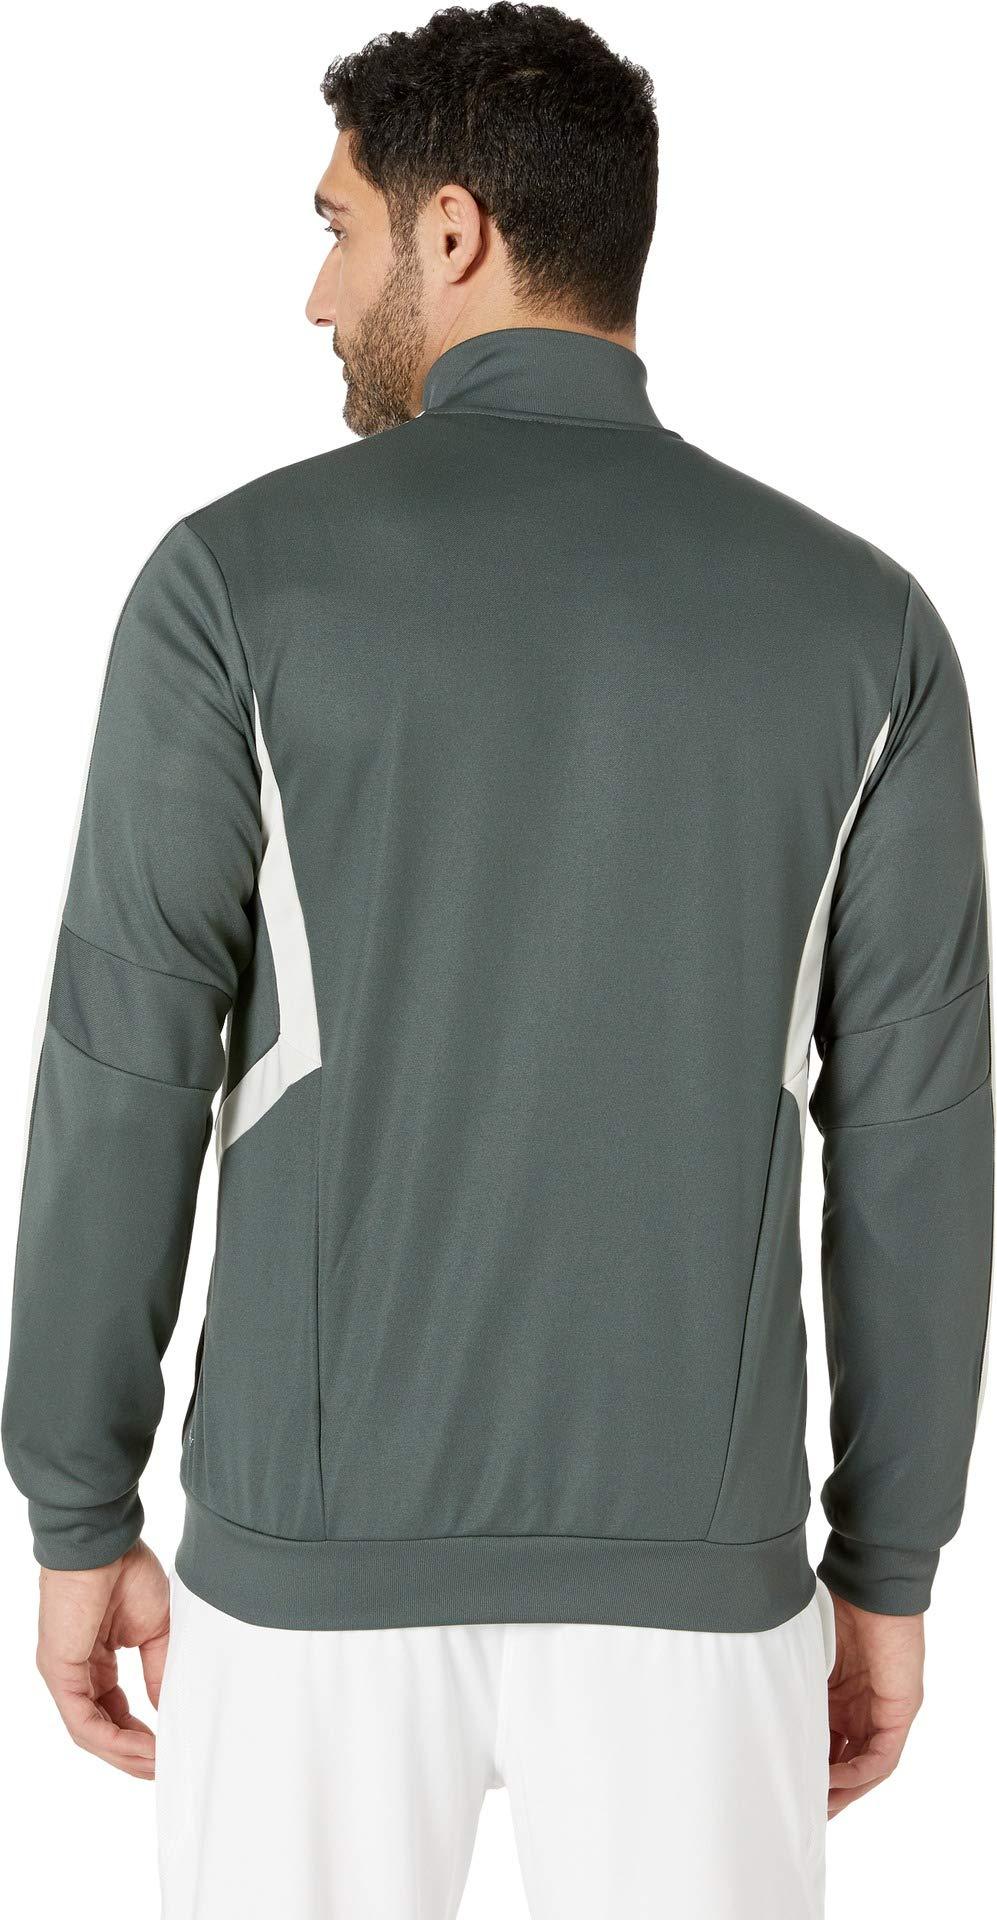 adidas Men's AFS Tiro Track Jacket Legend Ivy/Raw White Small